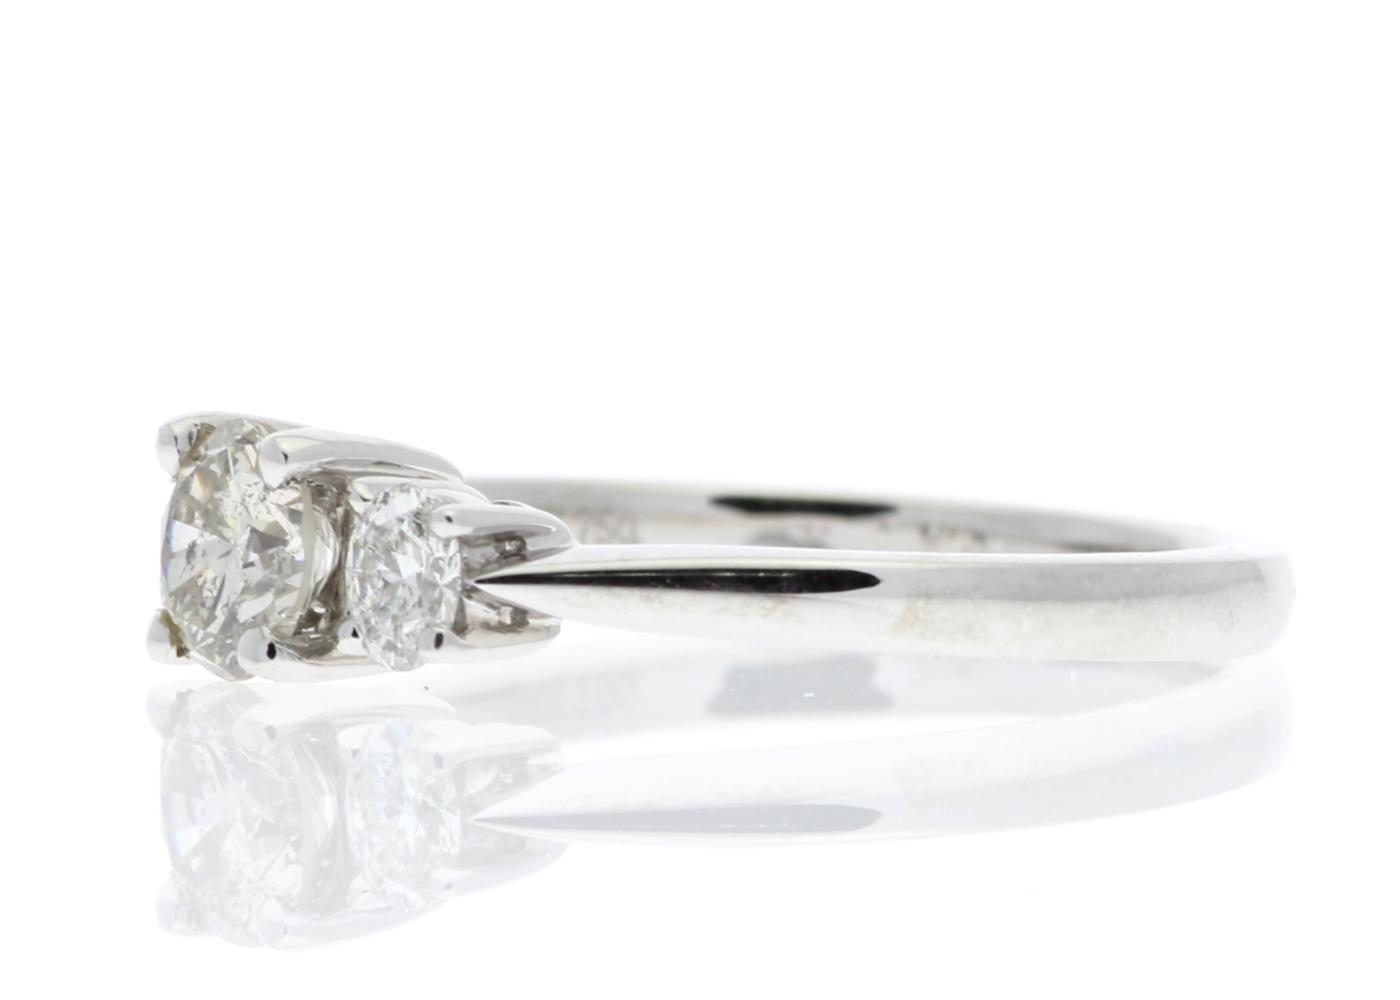 Lot 30 - 18ct White Gold Three Stone Claw Set Diamond Ring 0.73 Carats